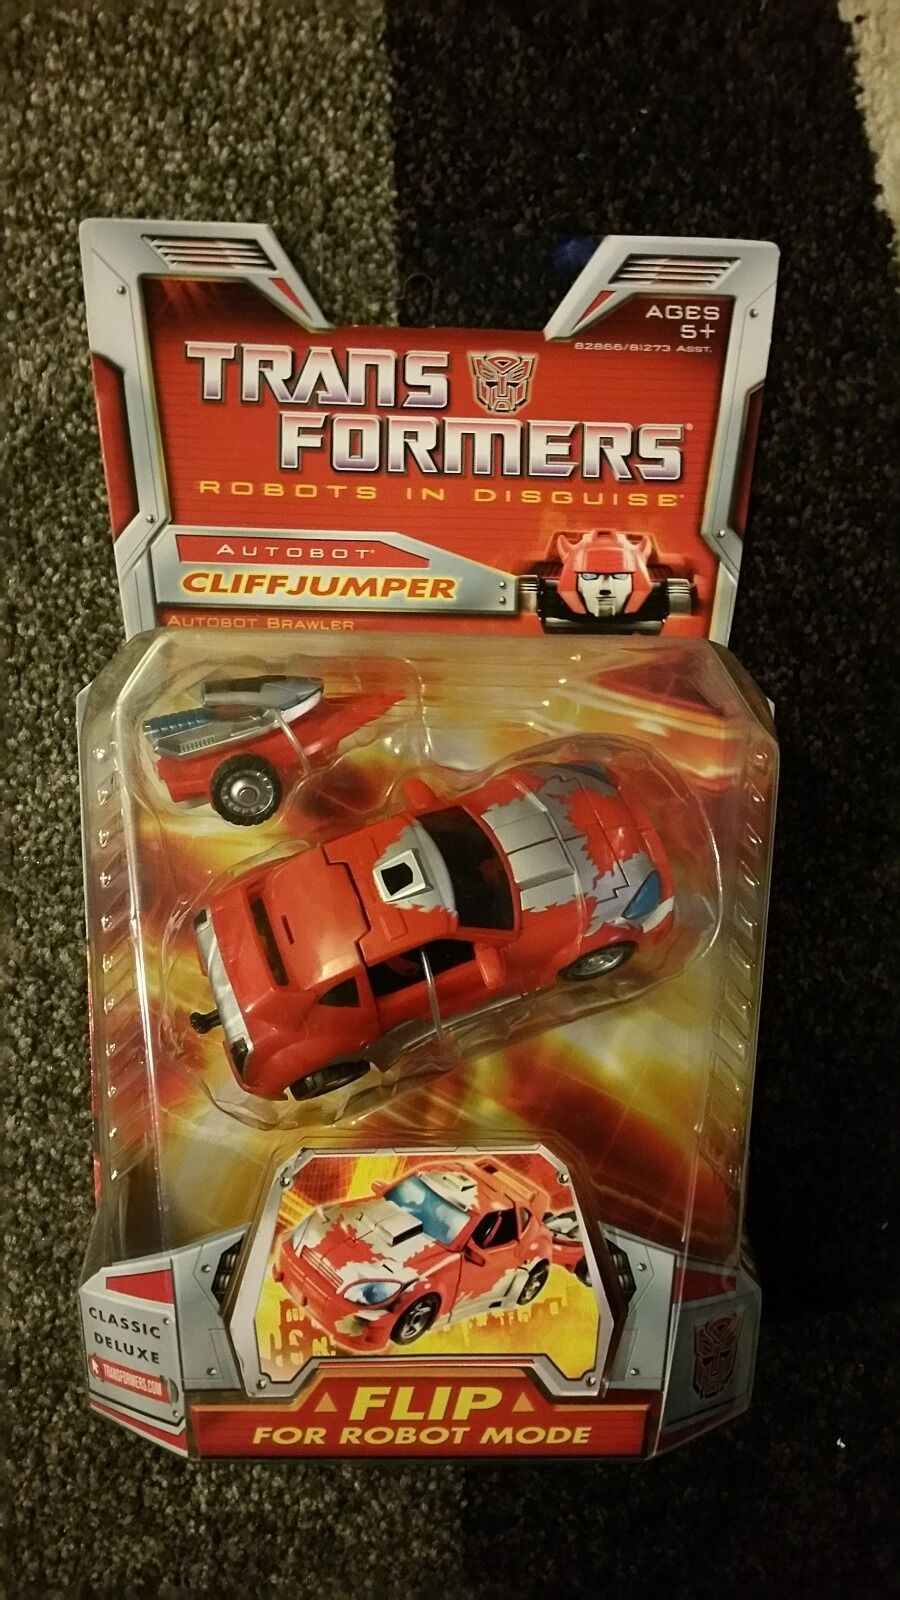 Transformers Universe 2006 Classic Series Cliffjumper Autobot Deluxe Class MISB